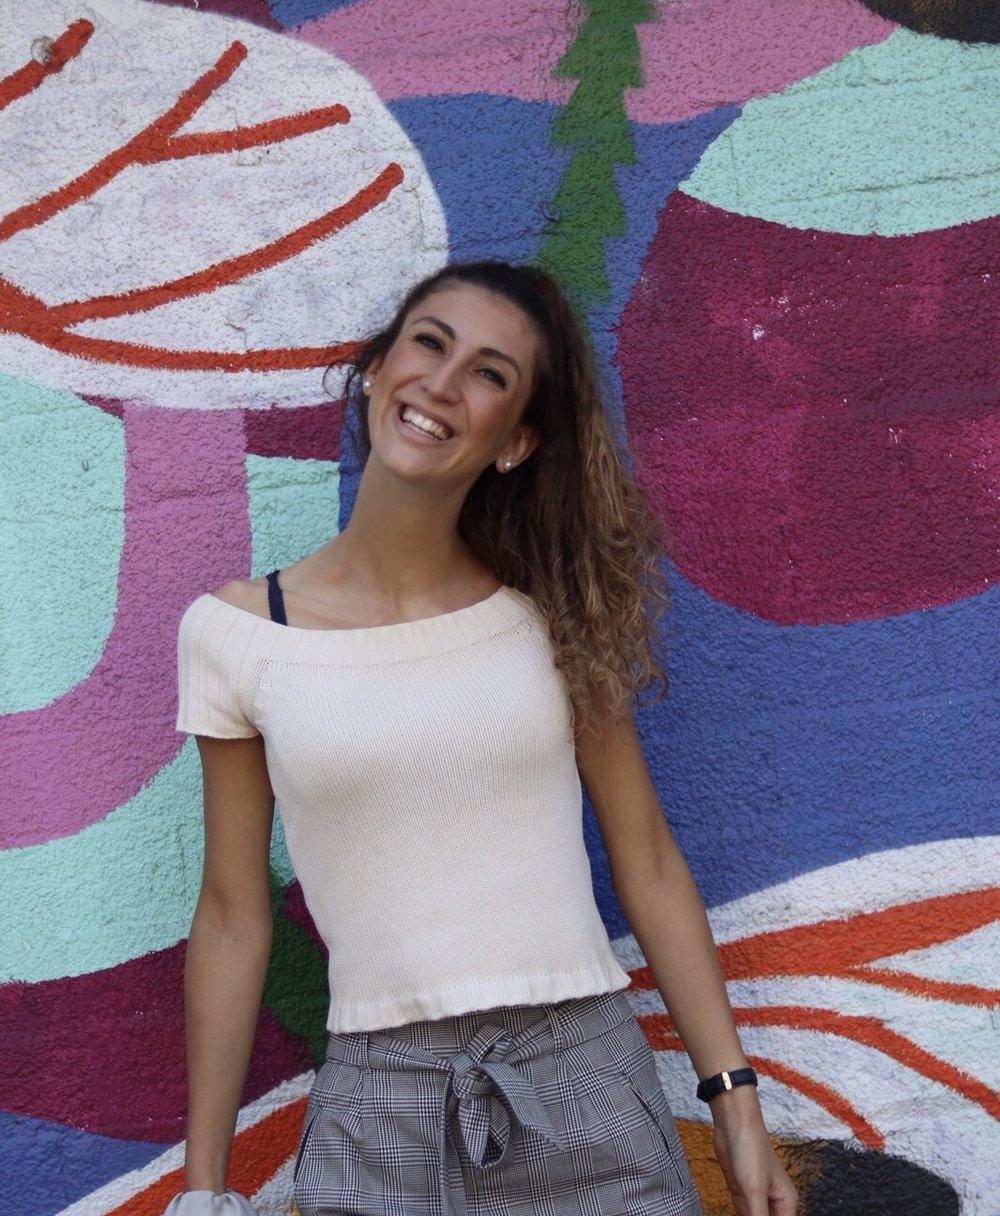 Giulia Belotti - Italy Coordinator   University of Trento C'22   ItalyCoordinator@thinkoceanglobal.org